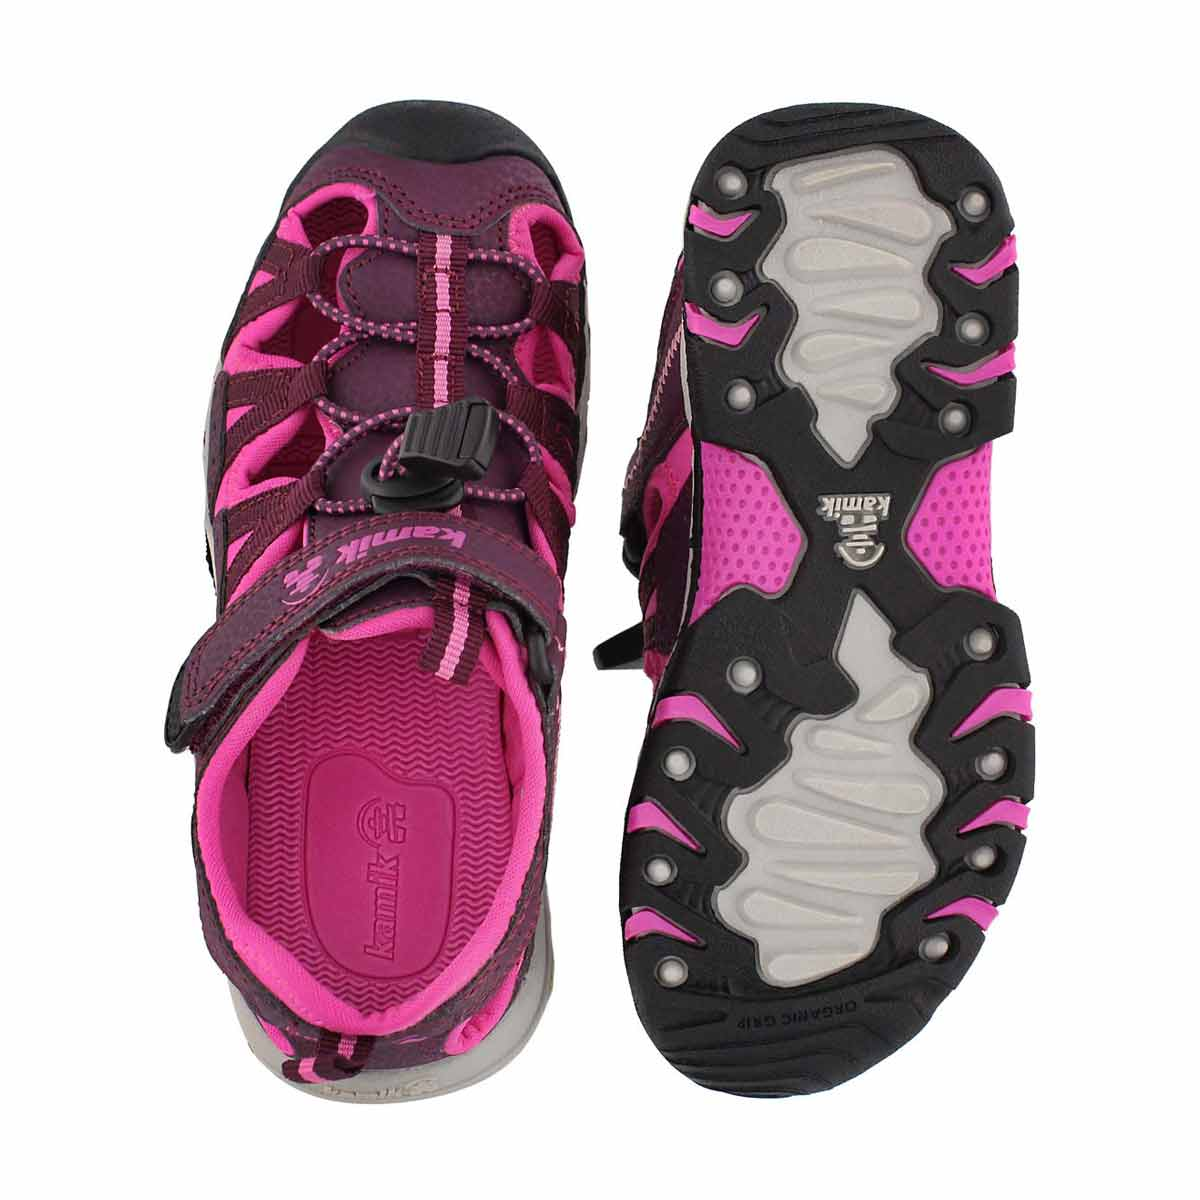 Grls Wildcat berry/pnk fisherman sandal